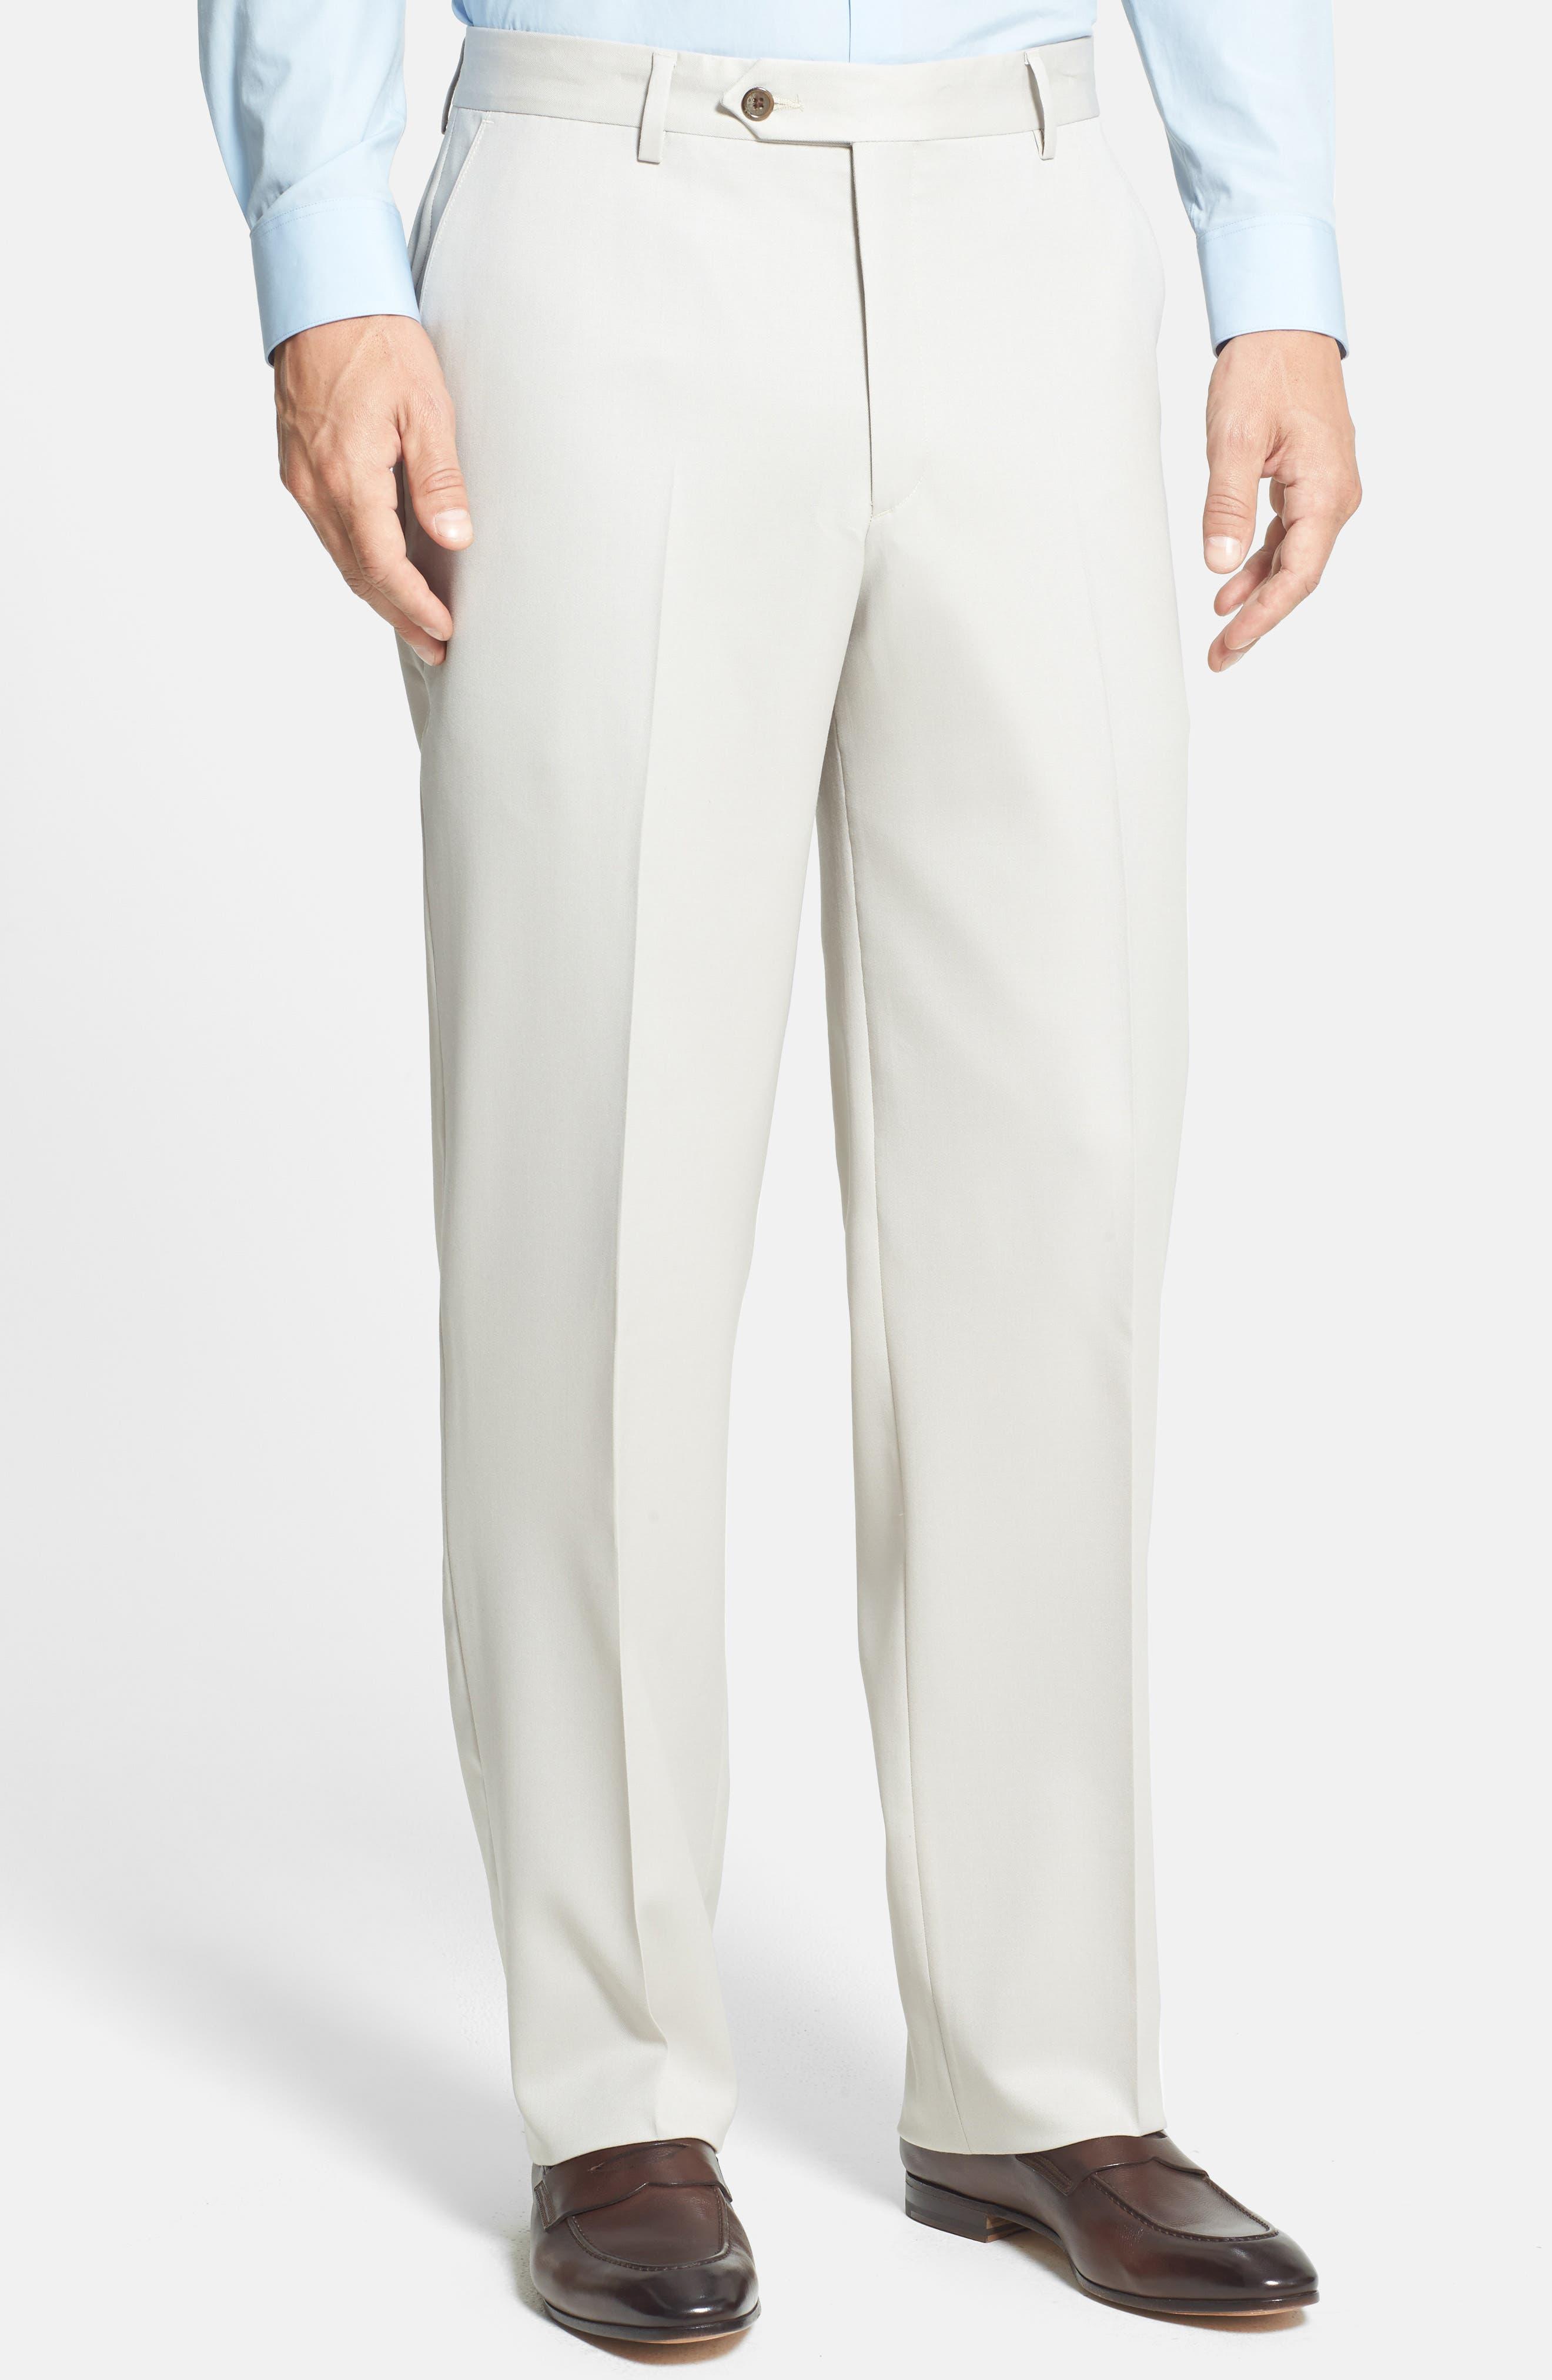 BERLE, Flat Front Wool Gabardine Trousers, Alternate thumbnail 5, color, STONE